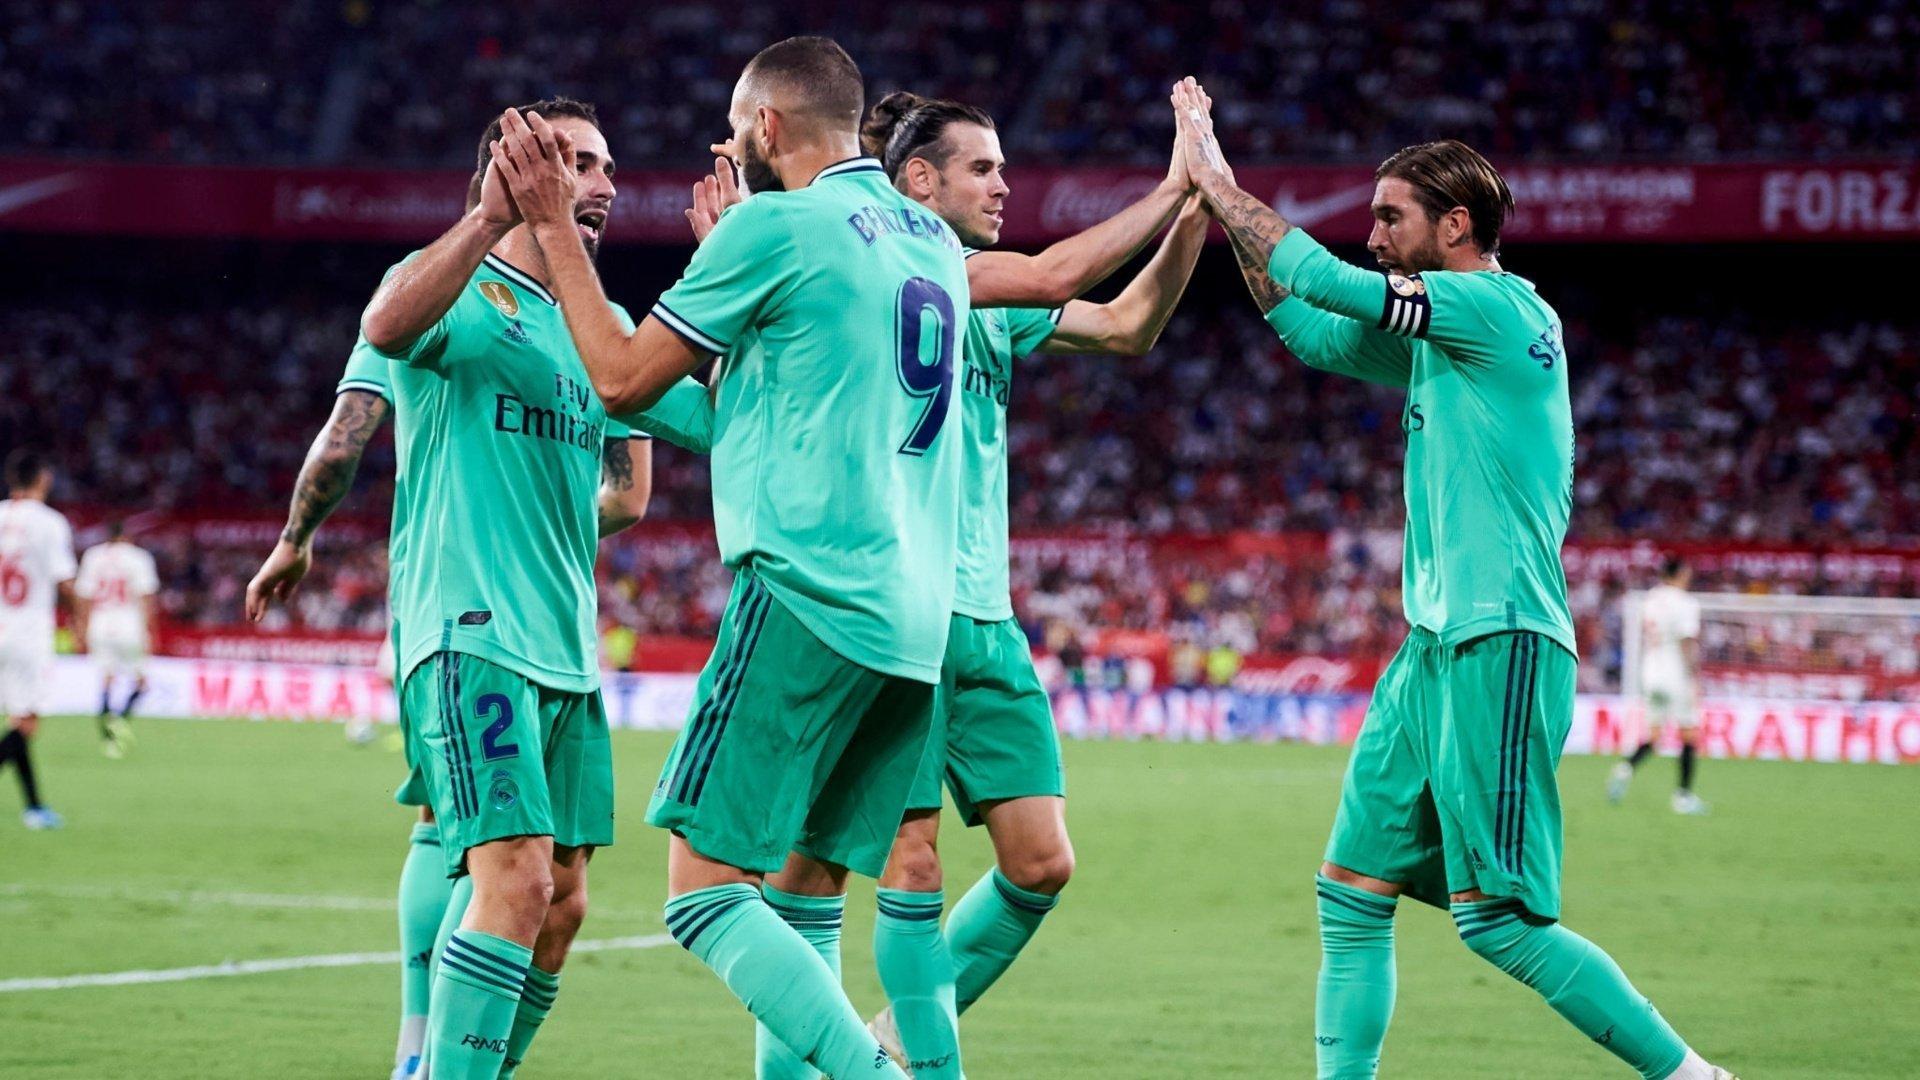 Preview: Real Madrid vs Espanyol